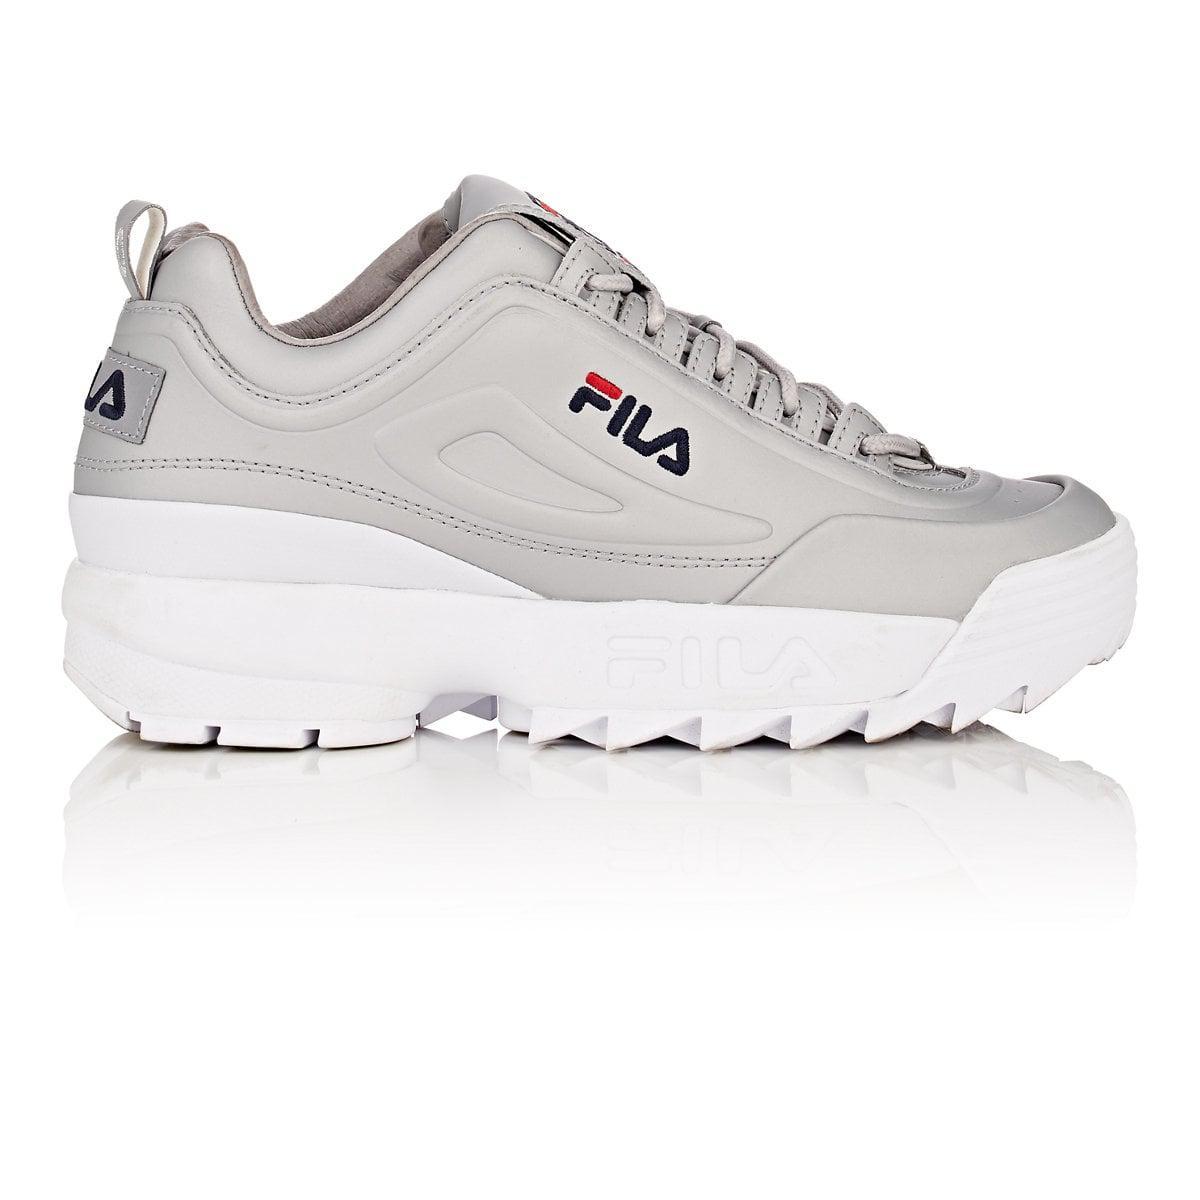 fila shoes disruptor 2 summit